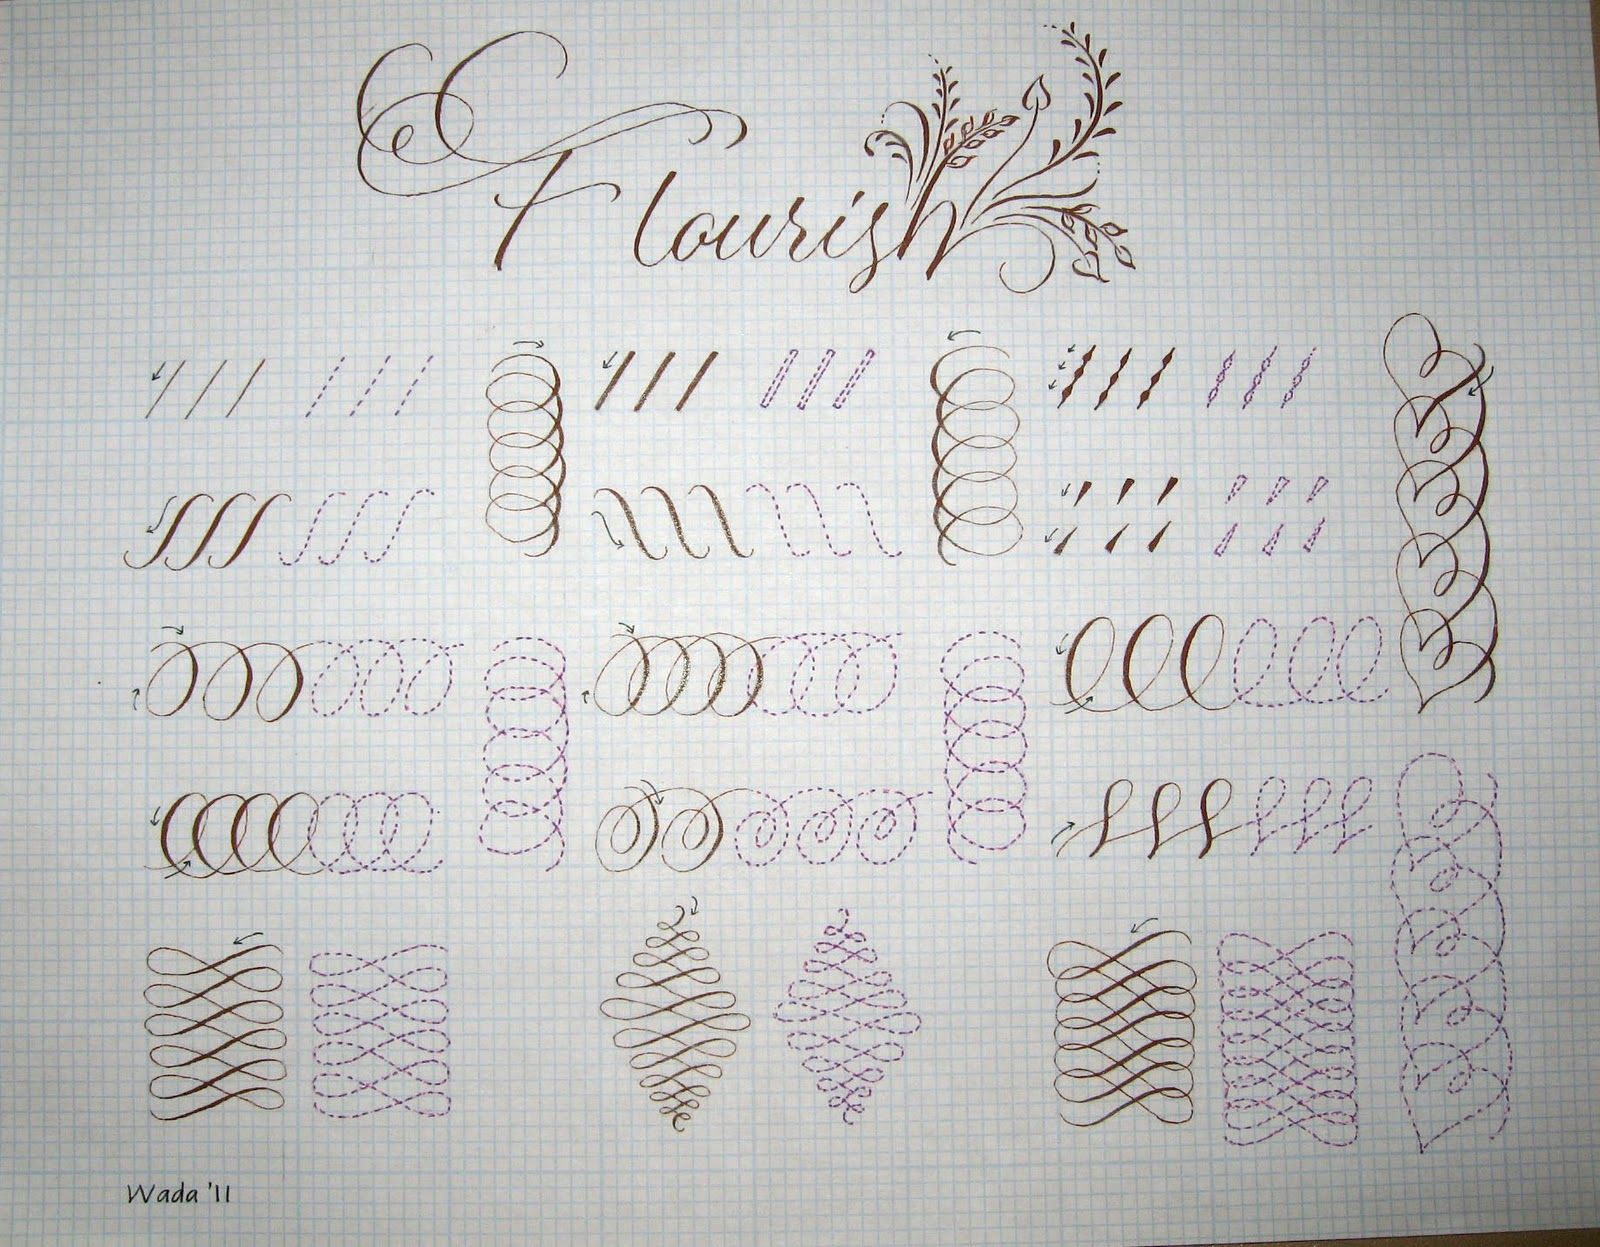 Deann Singh Calligraphy November 21 2011 Pointed Pen